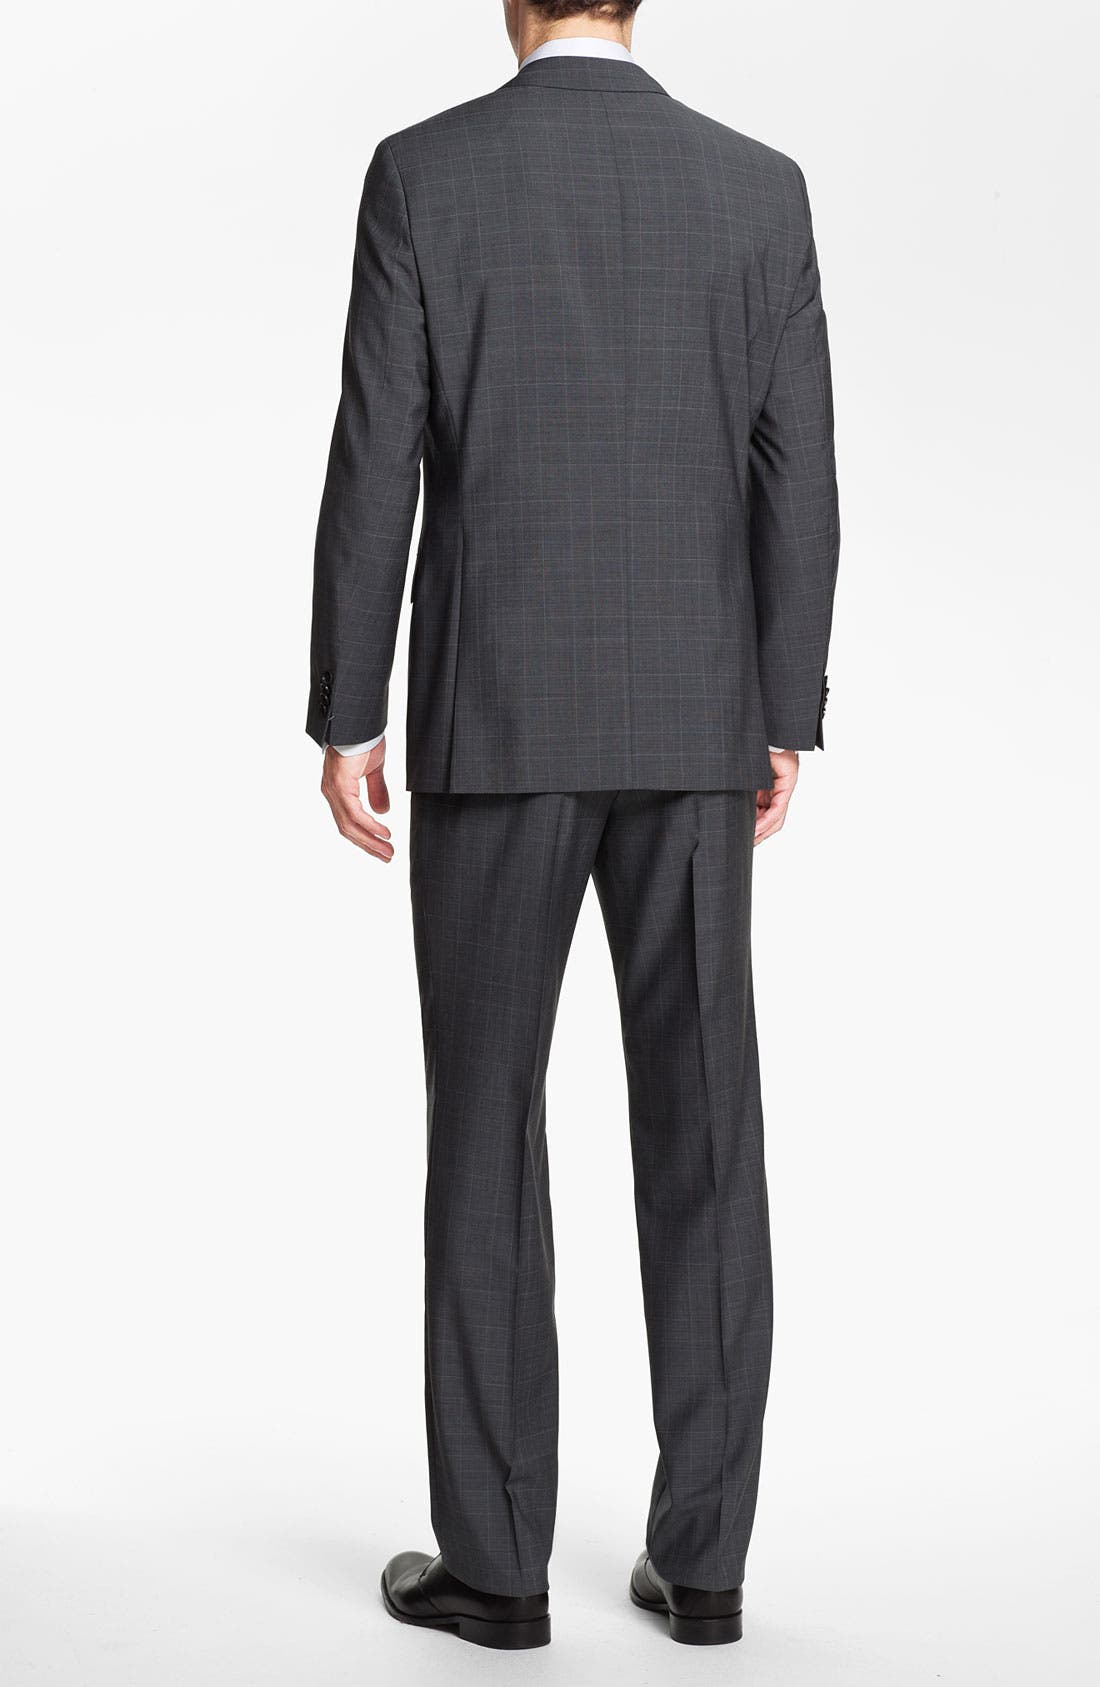 BOSS Black 'Pasini/Movie' Plaid Suit,                             Alternate thumbnail 6, color,                             030